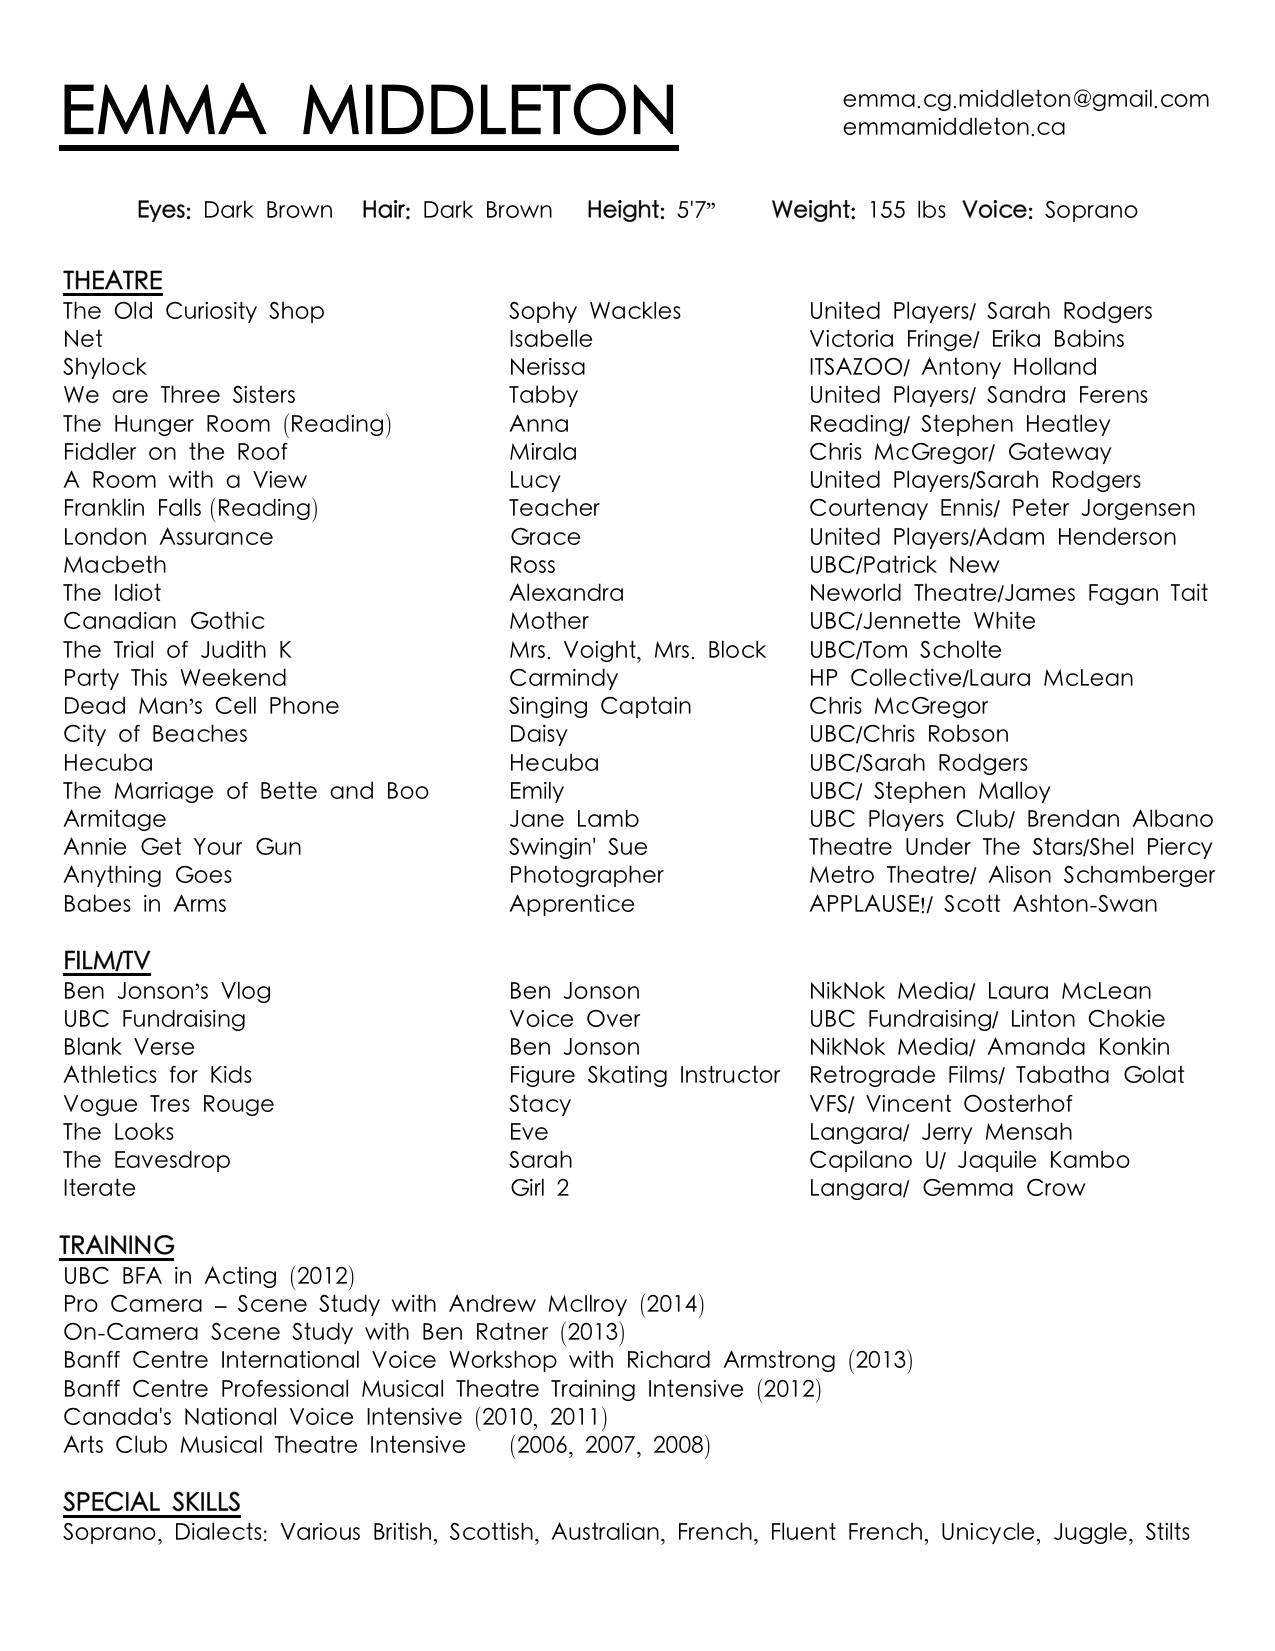 resume wordpress theme 2014 sample resume service resume wordpress theme 2014 artisteer web design software and joomla template maker emma middleton resume